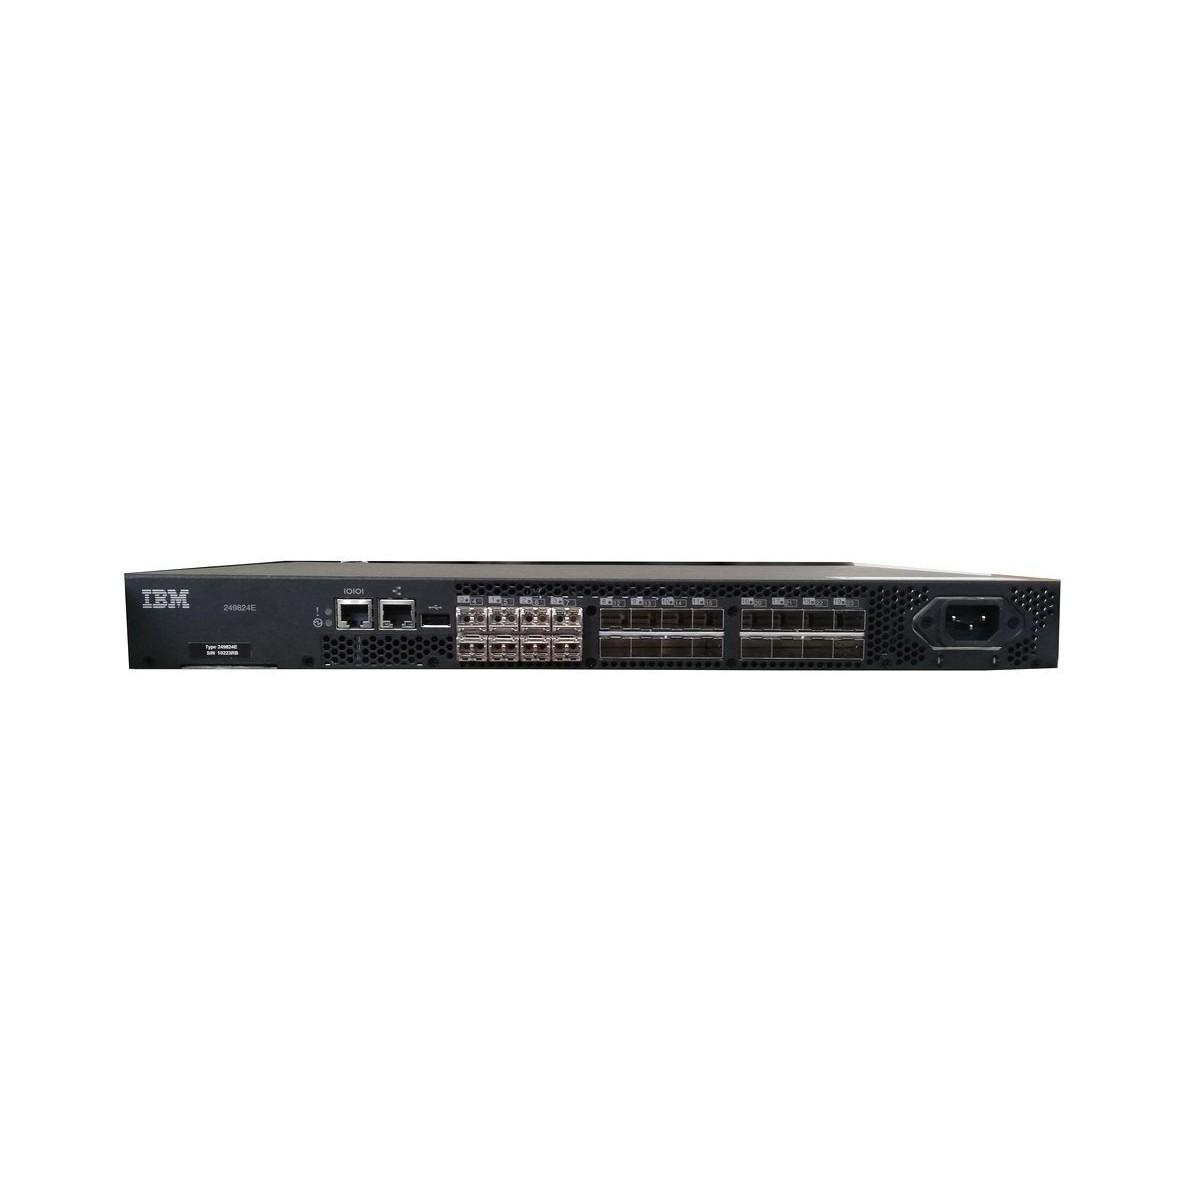 SWITCH IBM SAN24B-4 8xACT PORT 8xGBIC 249824E